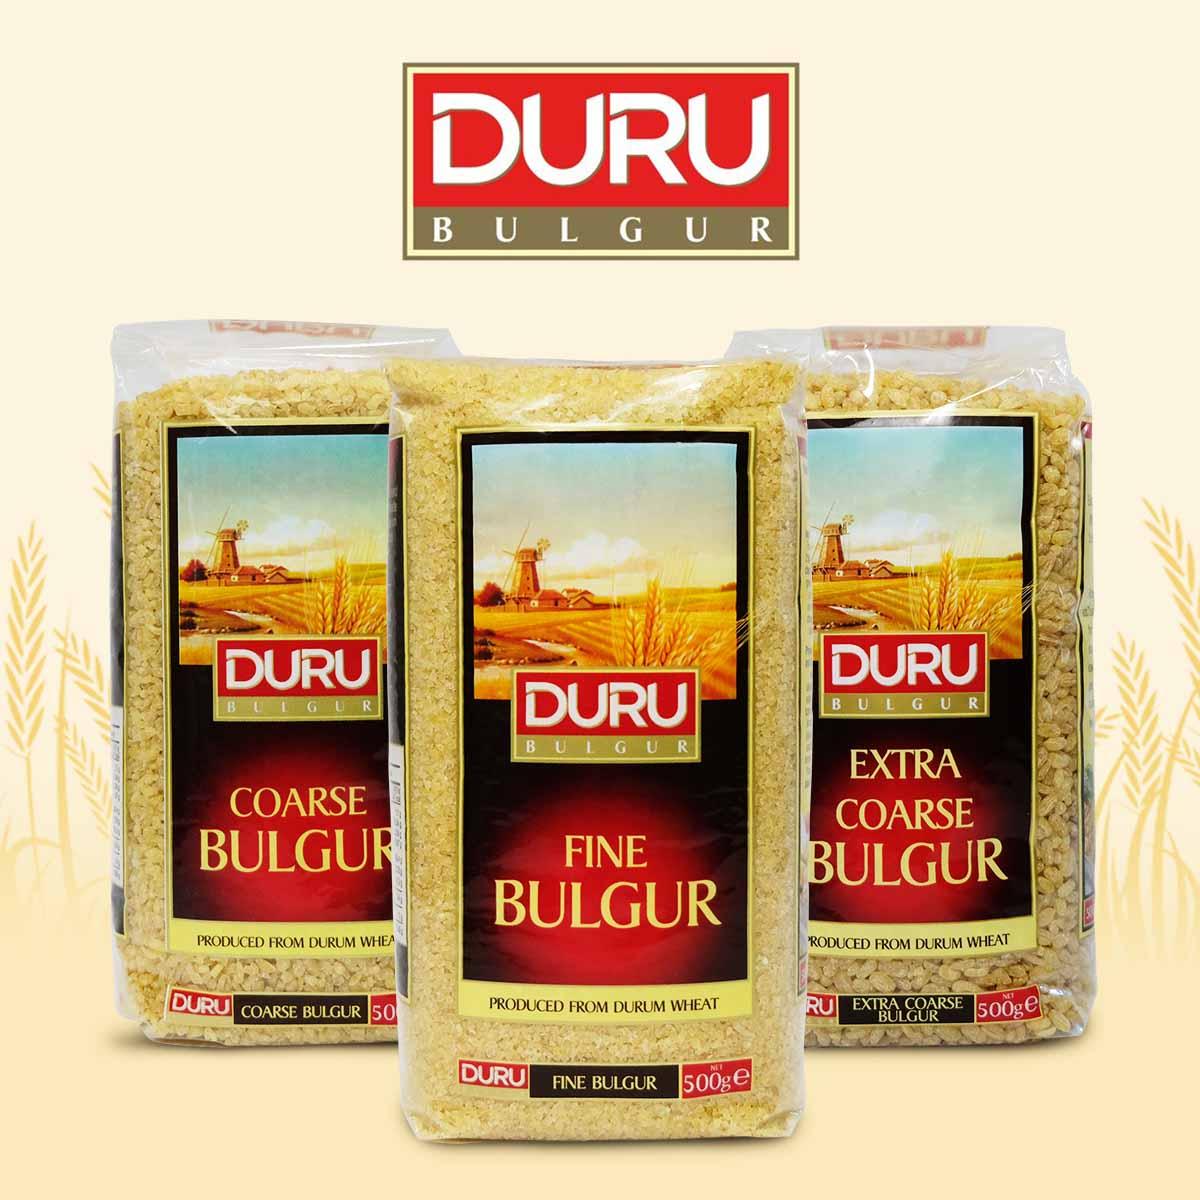 A healthier alternative to rice: Duru Bulgur